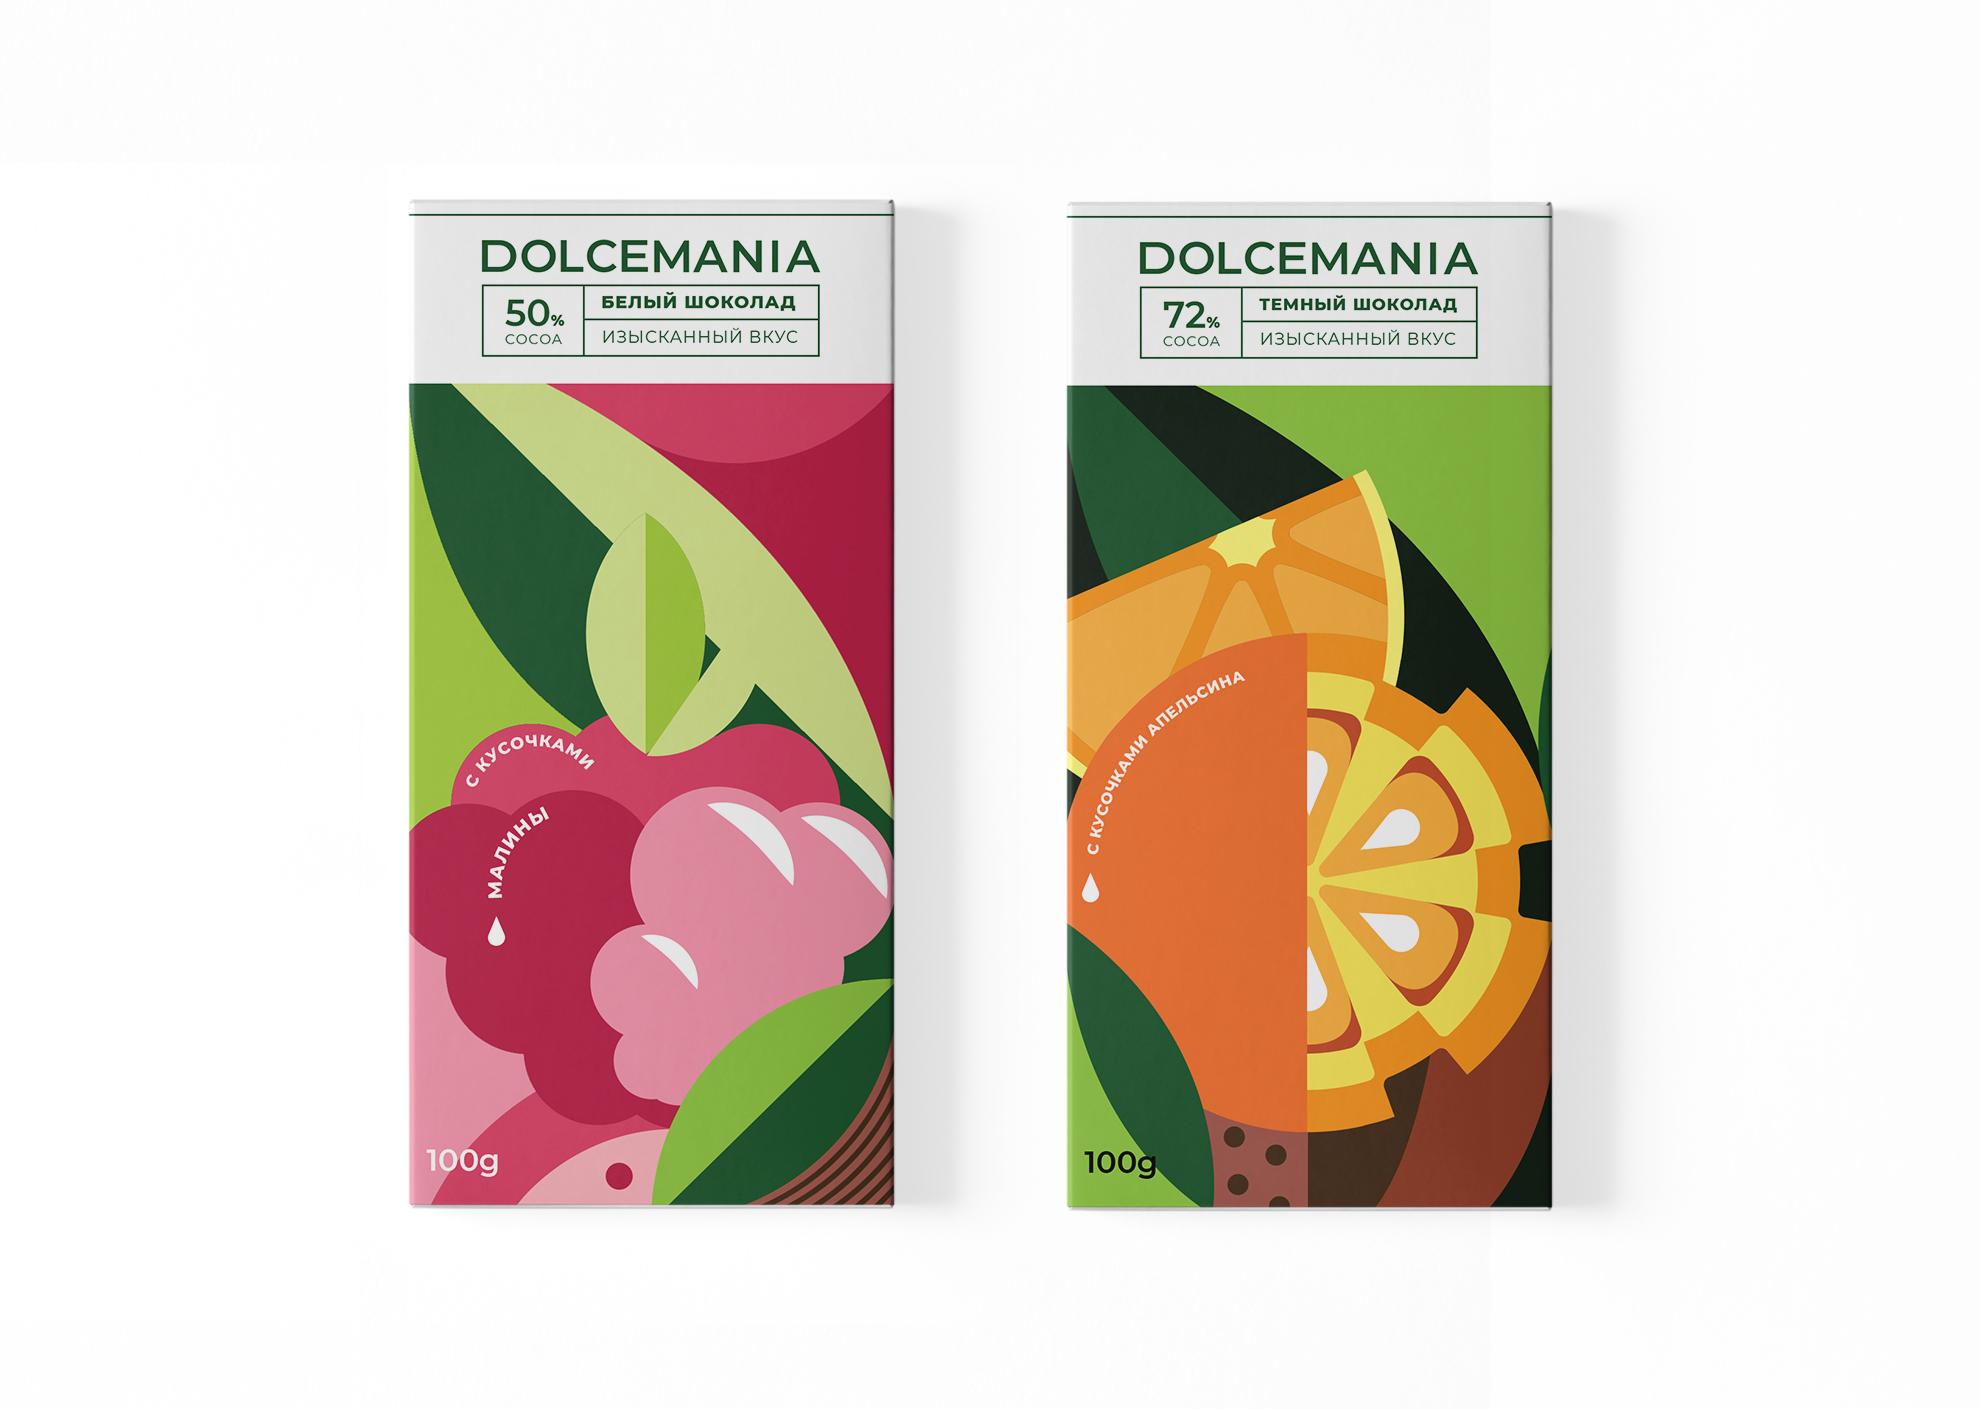 Anastasiya Yudina Creates Illustration and Packaging Concept for Dolcemania Chocolate